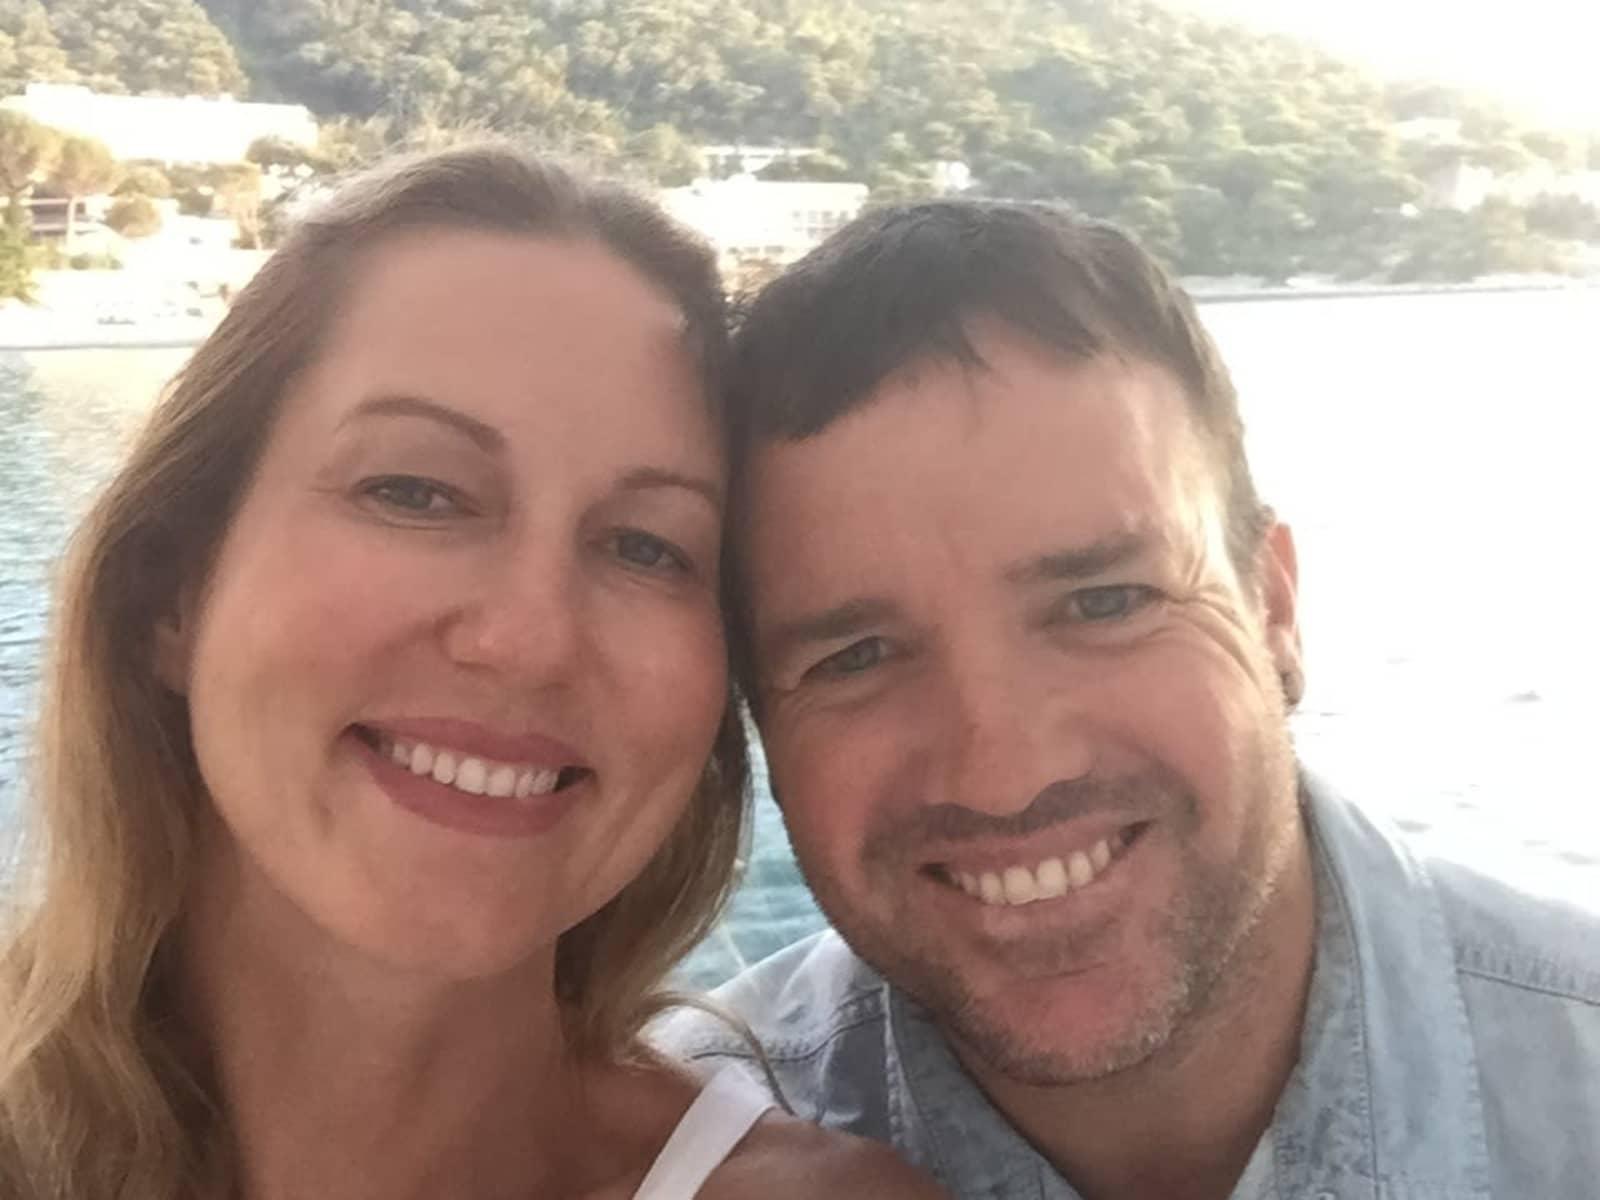 Kelly & Danny from Perth, Western Australia, Australia